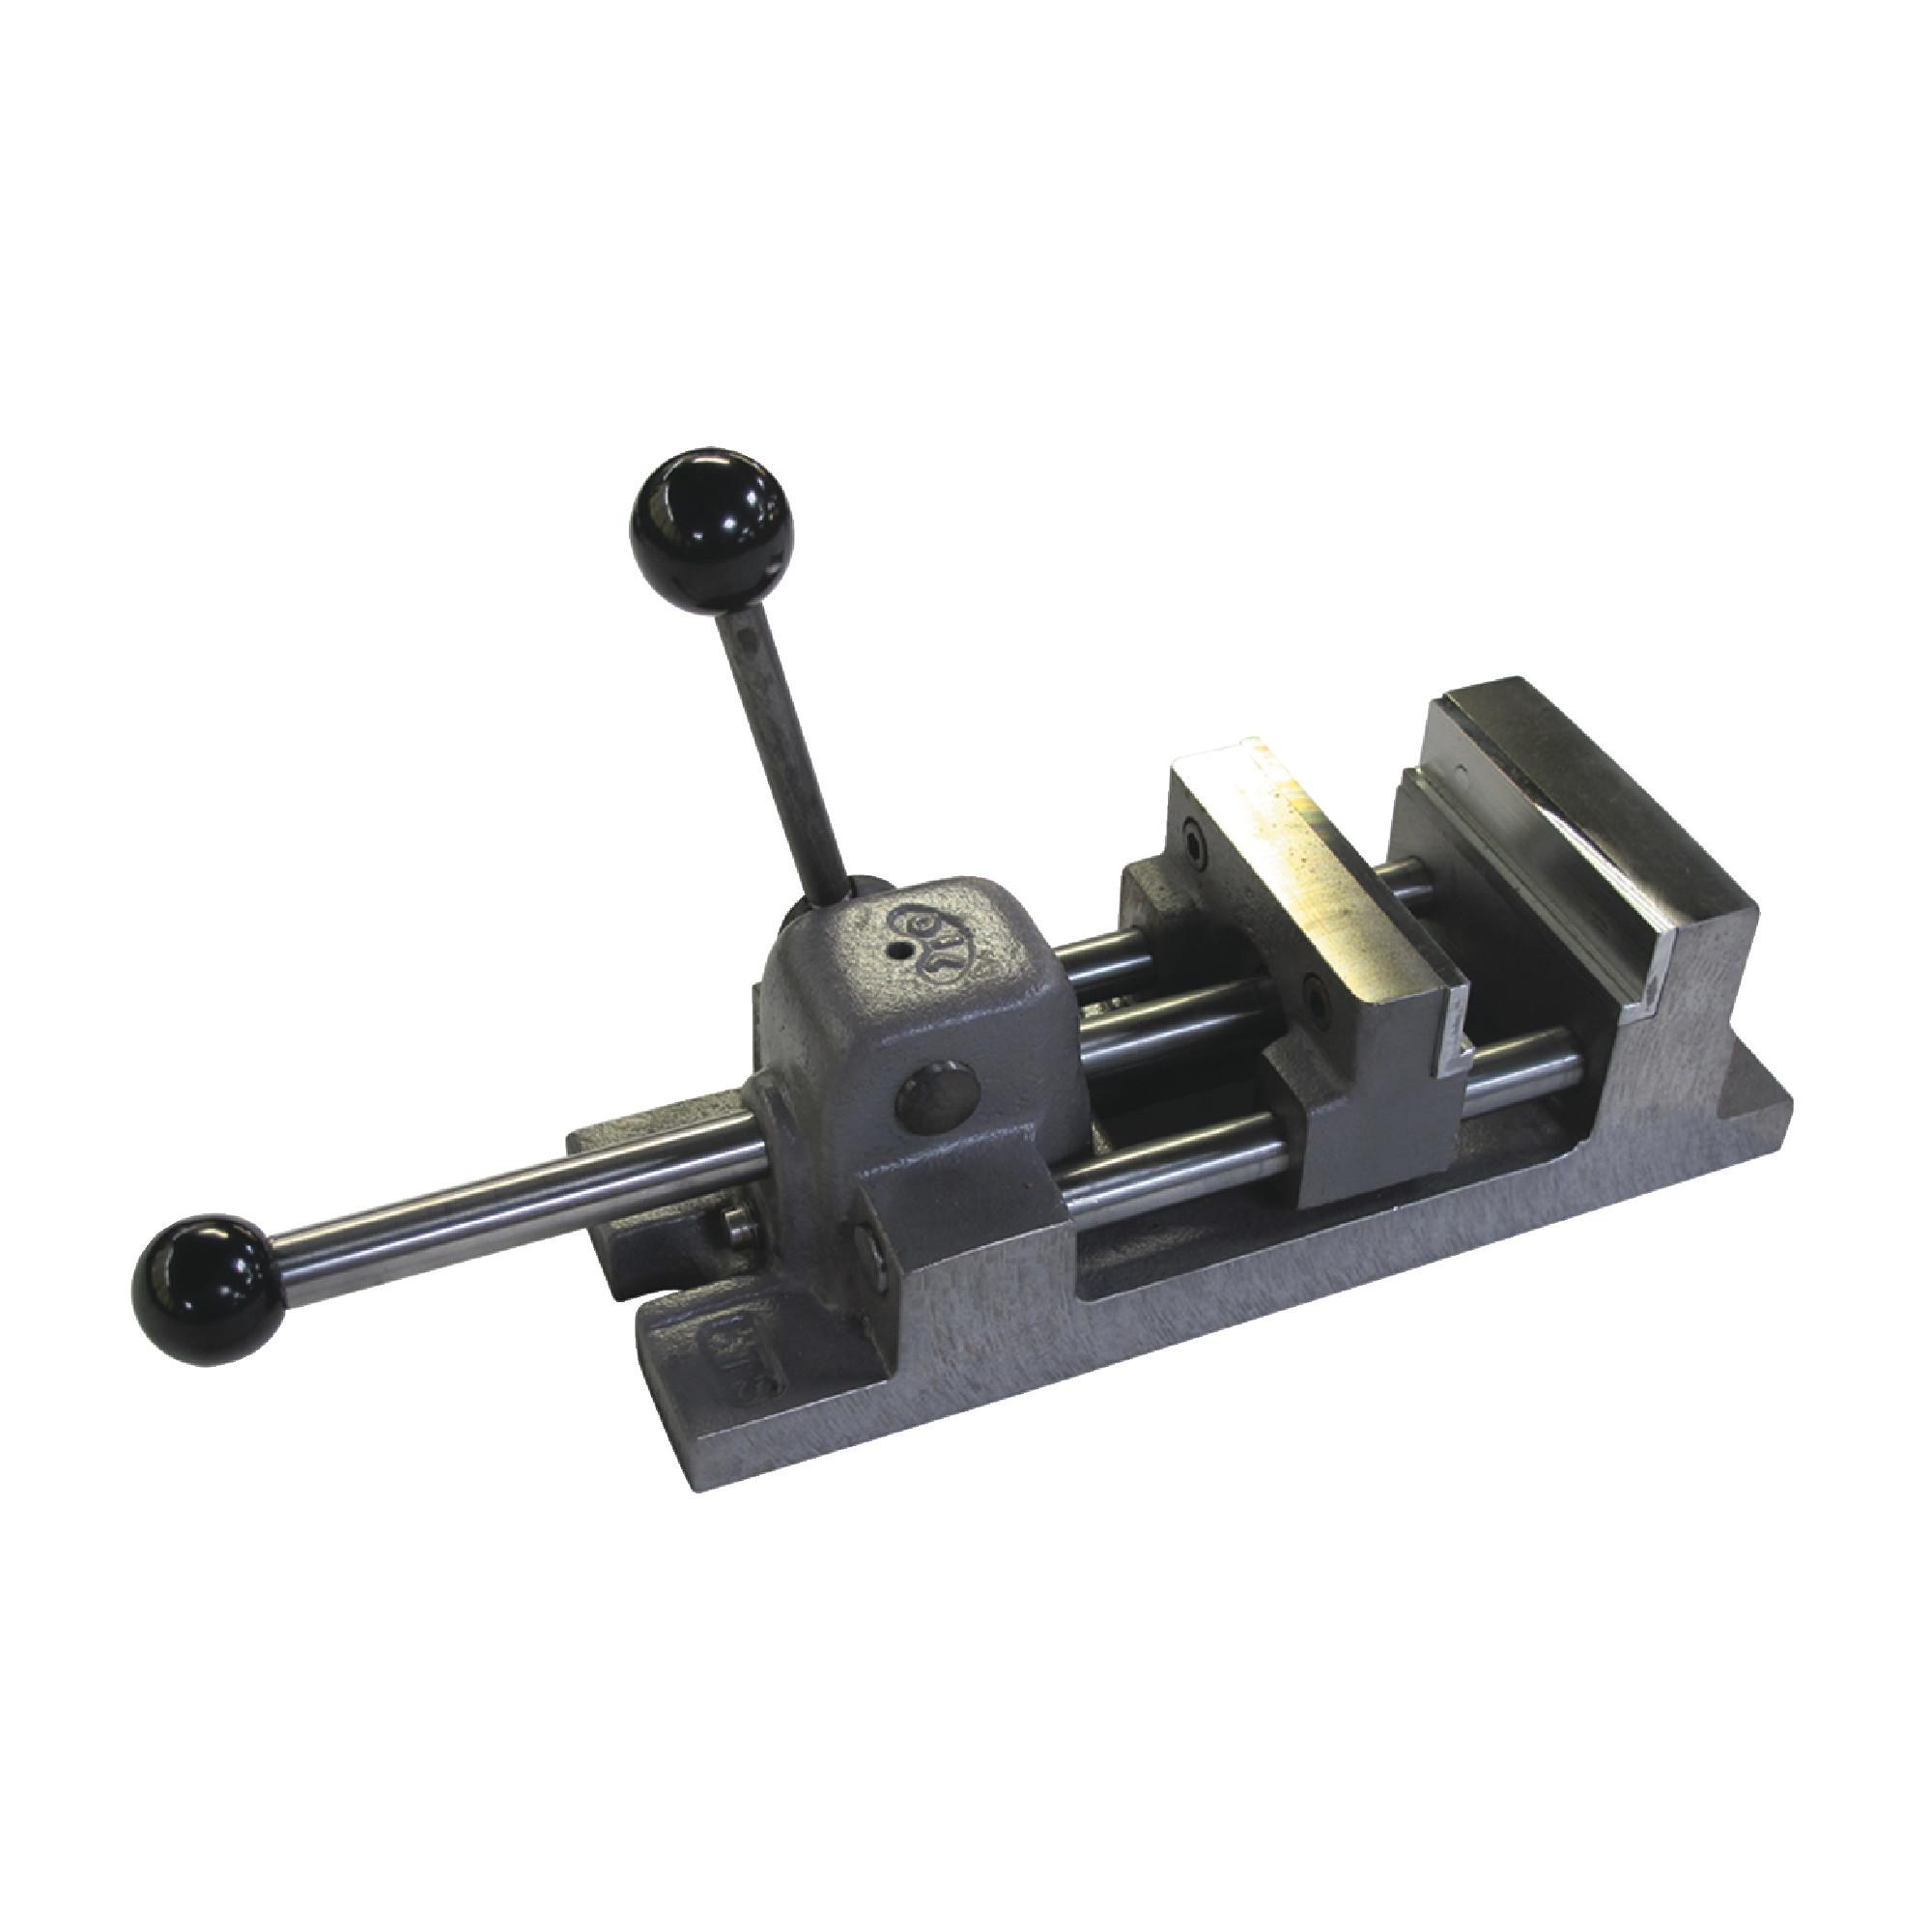 Grip-Master Drill Press Vise